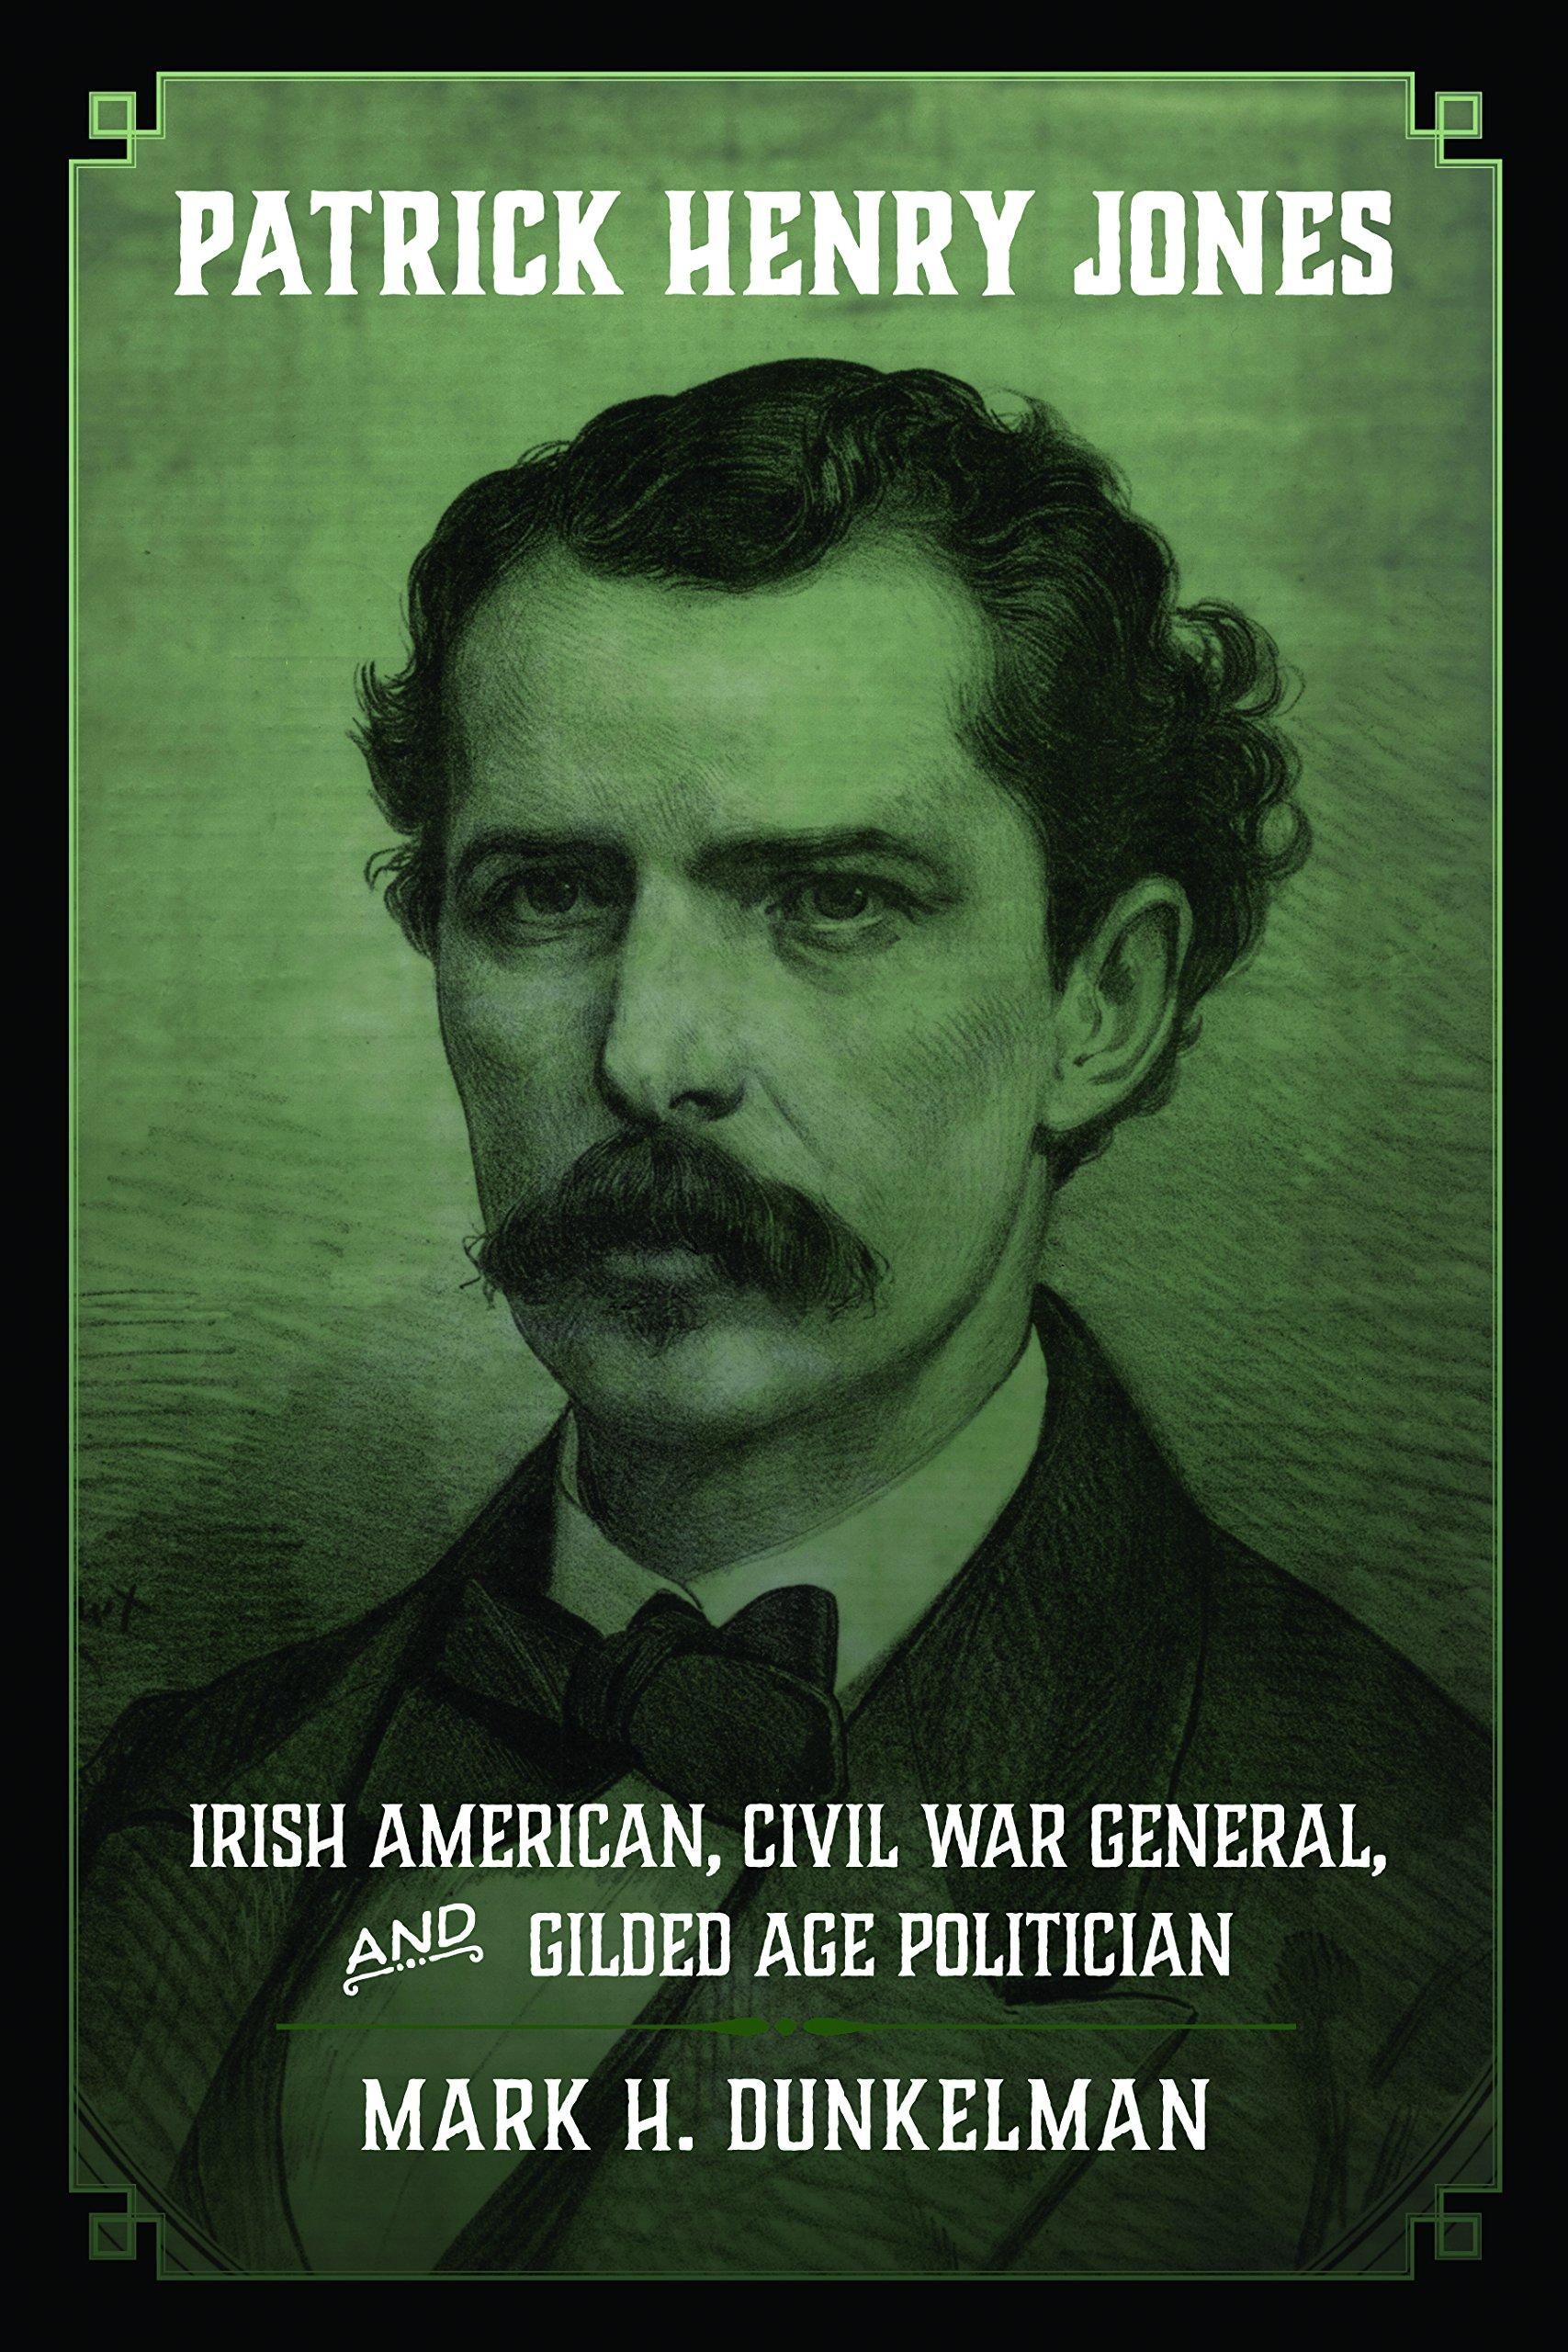 Patrick Henry Jones: Irish American, Civil War General and Gilded Age Politician by Mark H. Dunkelman